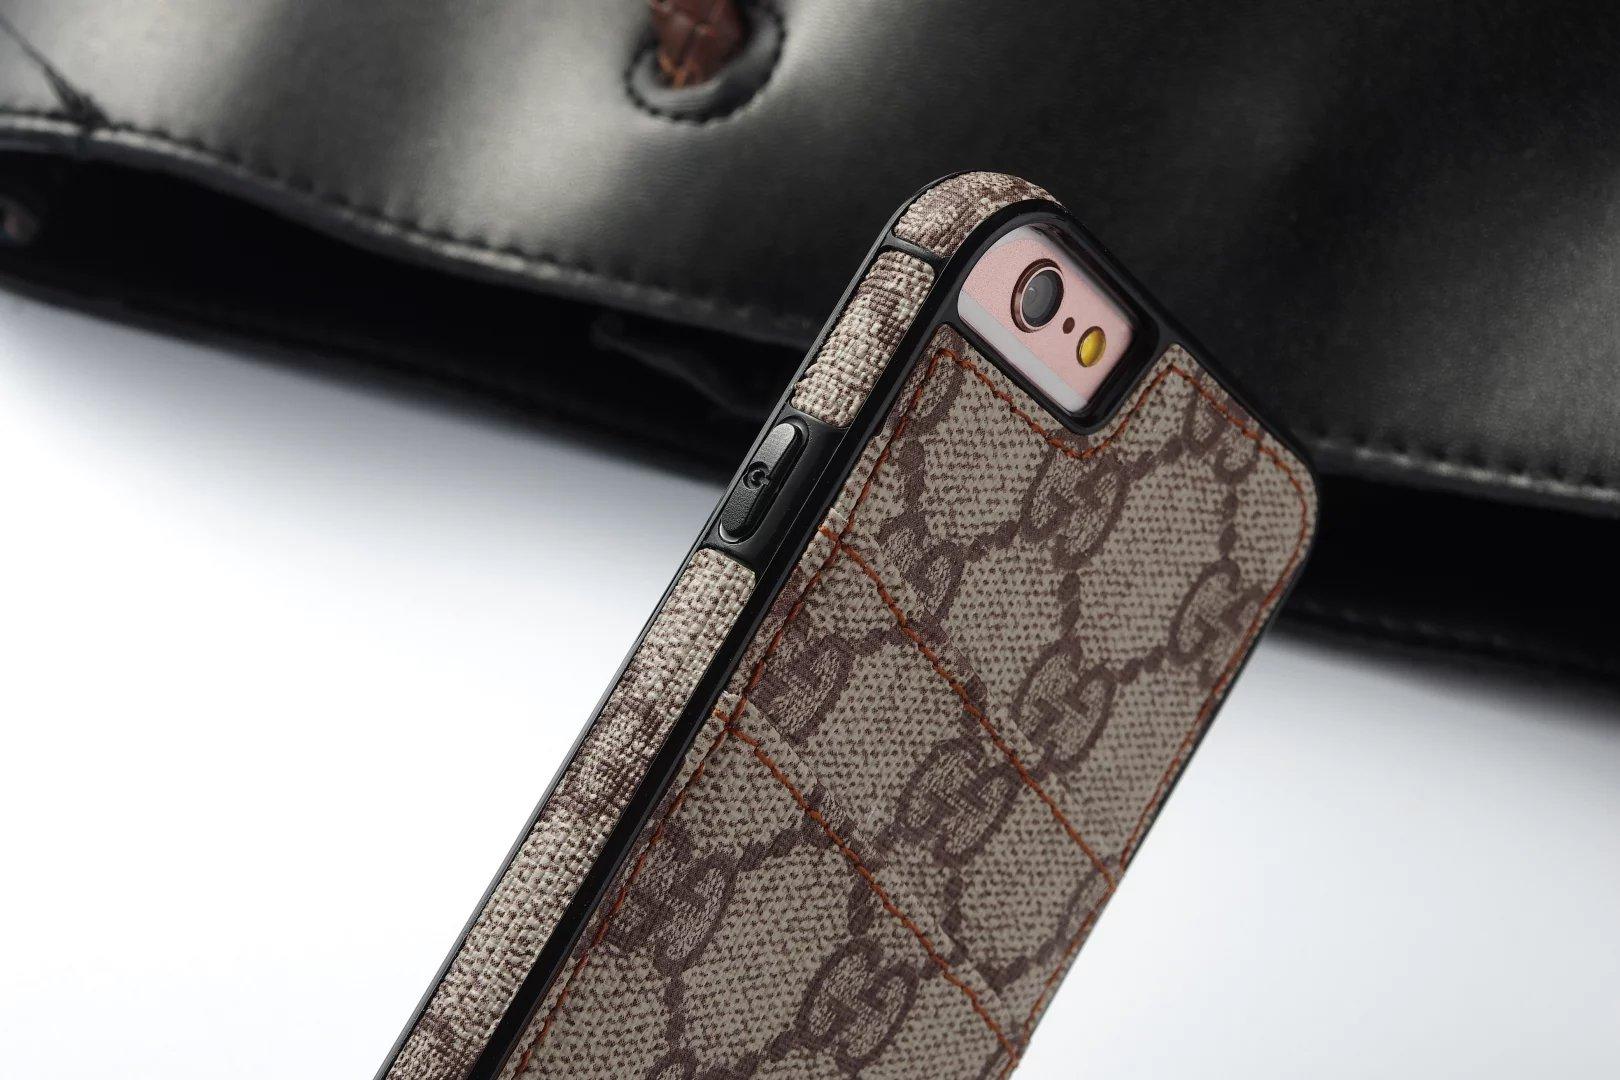 iphone hülle foto iphone hülle erstellen Louis Vuitton iphone 8 hüllen handyhülle 8lber bauen handyhülle s8 8lbst gestalten silikon handyhüllen iphone 8 iphone 8 mit hülle iphone hülle 8  schutzhülle mit eigenem foto